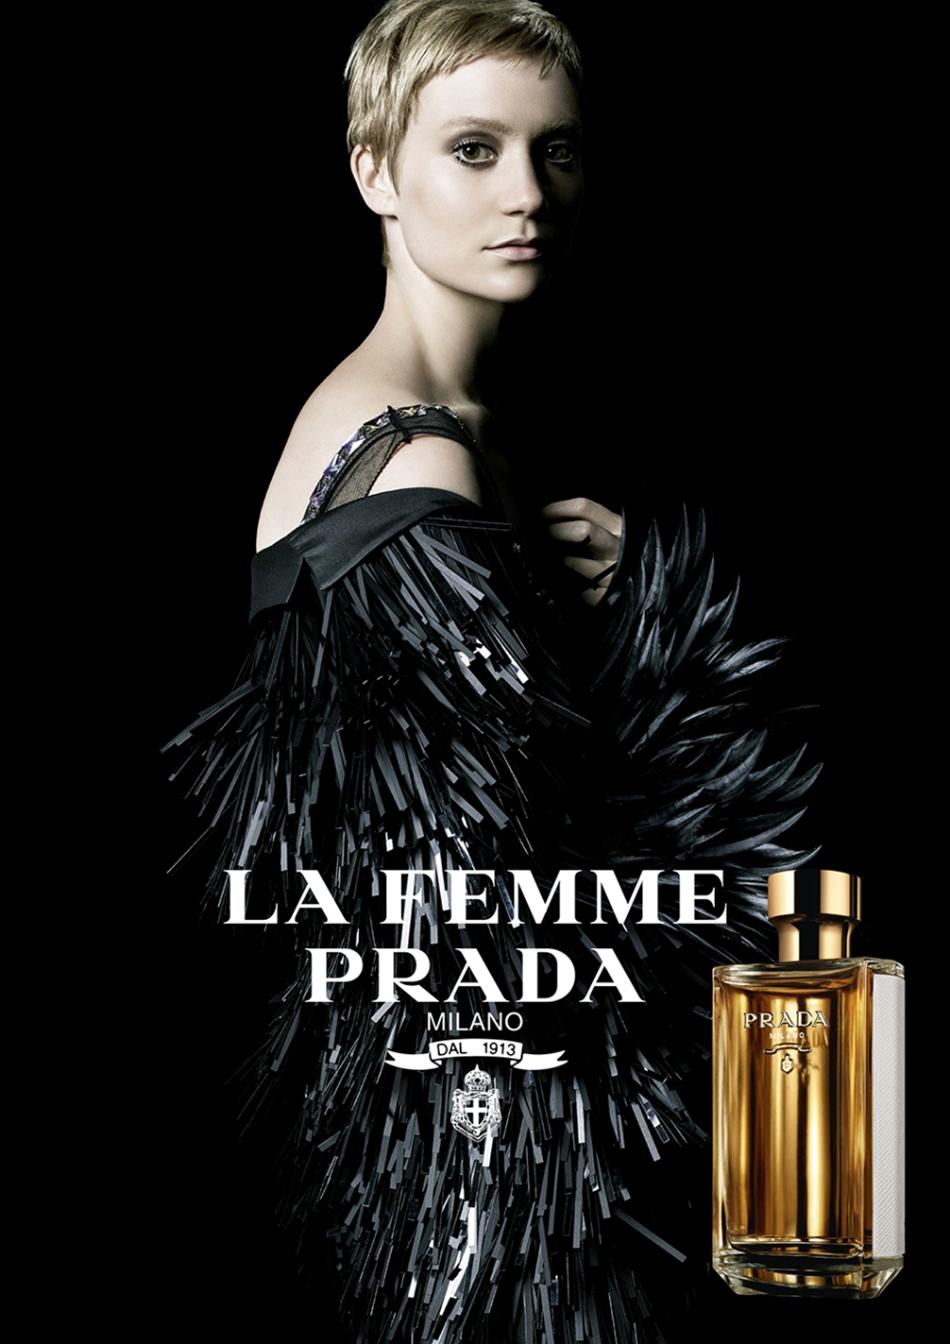 prada perfume 2